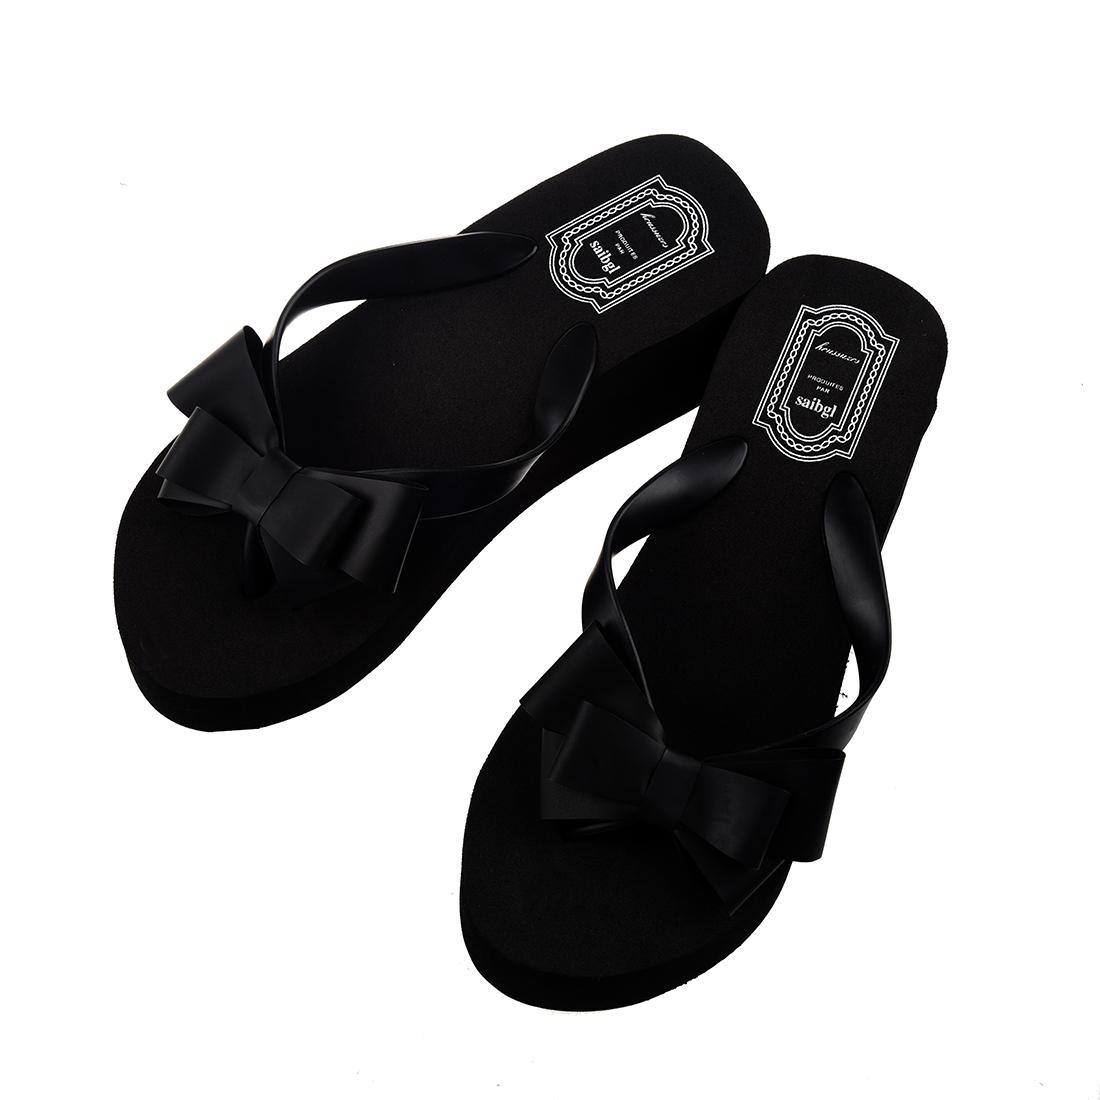 df927731e002 Ladies Summer Platform Flip Flops Thong Wedge Beach Sandals Knot Bow Shoes  Black 4size Shoes Black Shoes Bow Shoes Shoes Online with  31.82 Piece on  ...